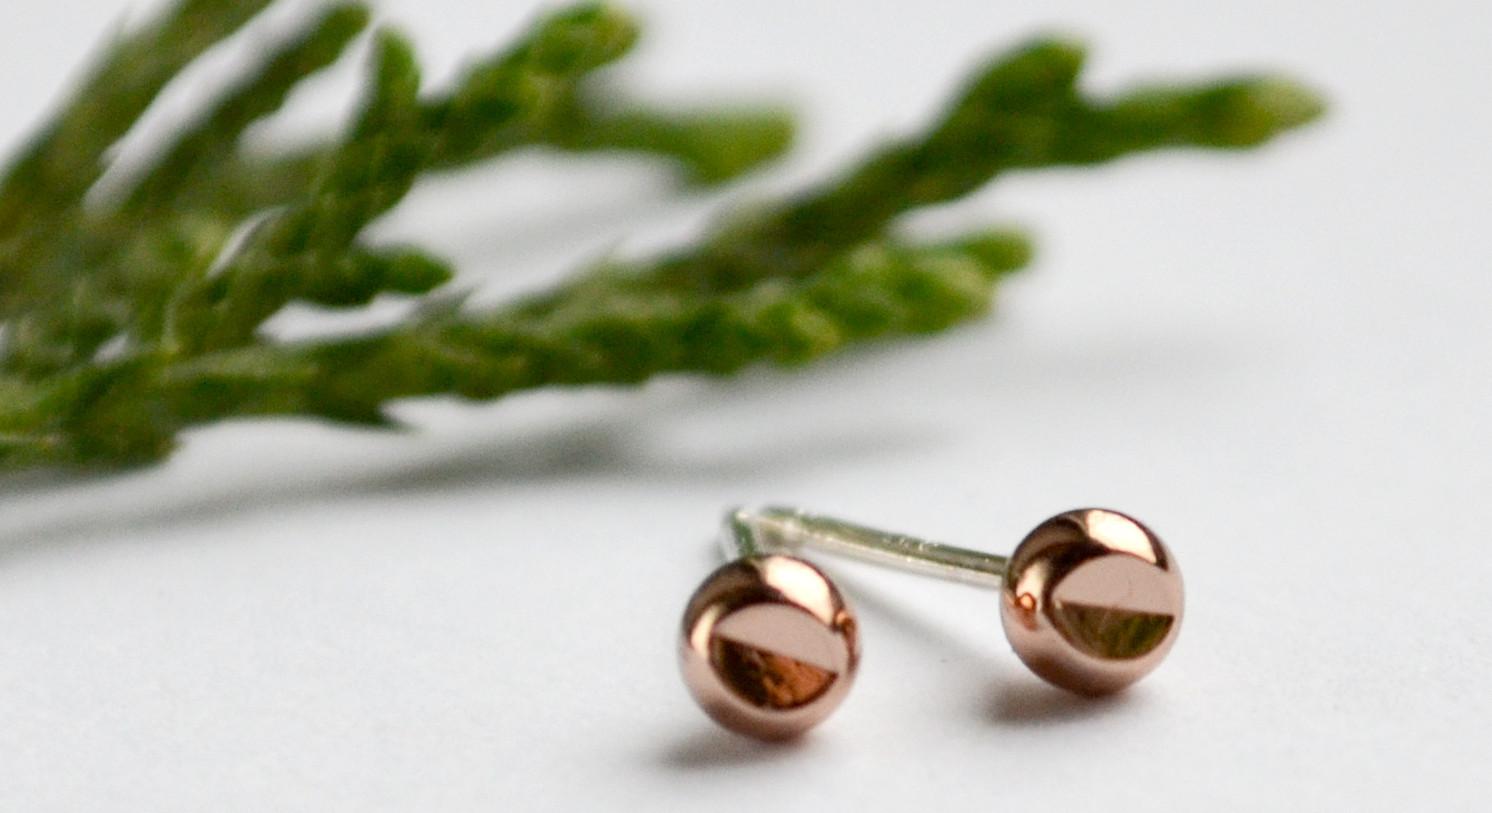 handmade modern jewelry, stud earrings and more!